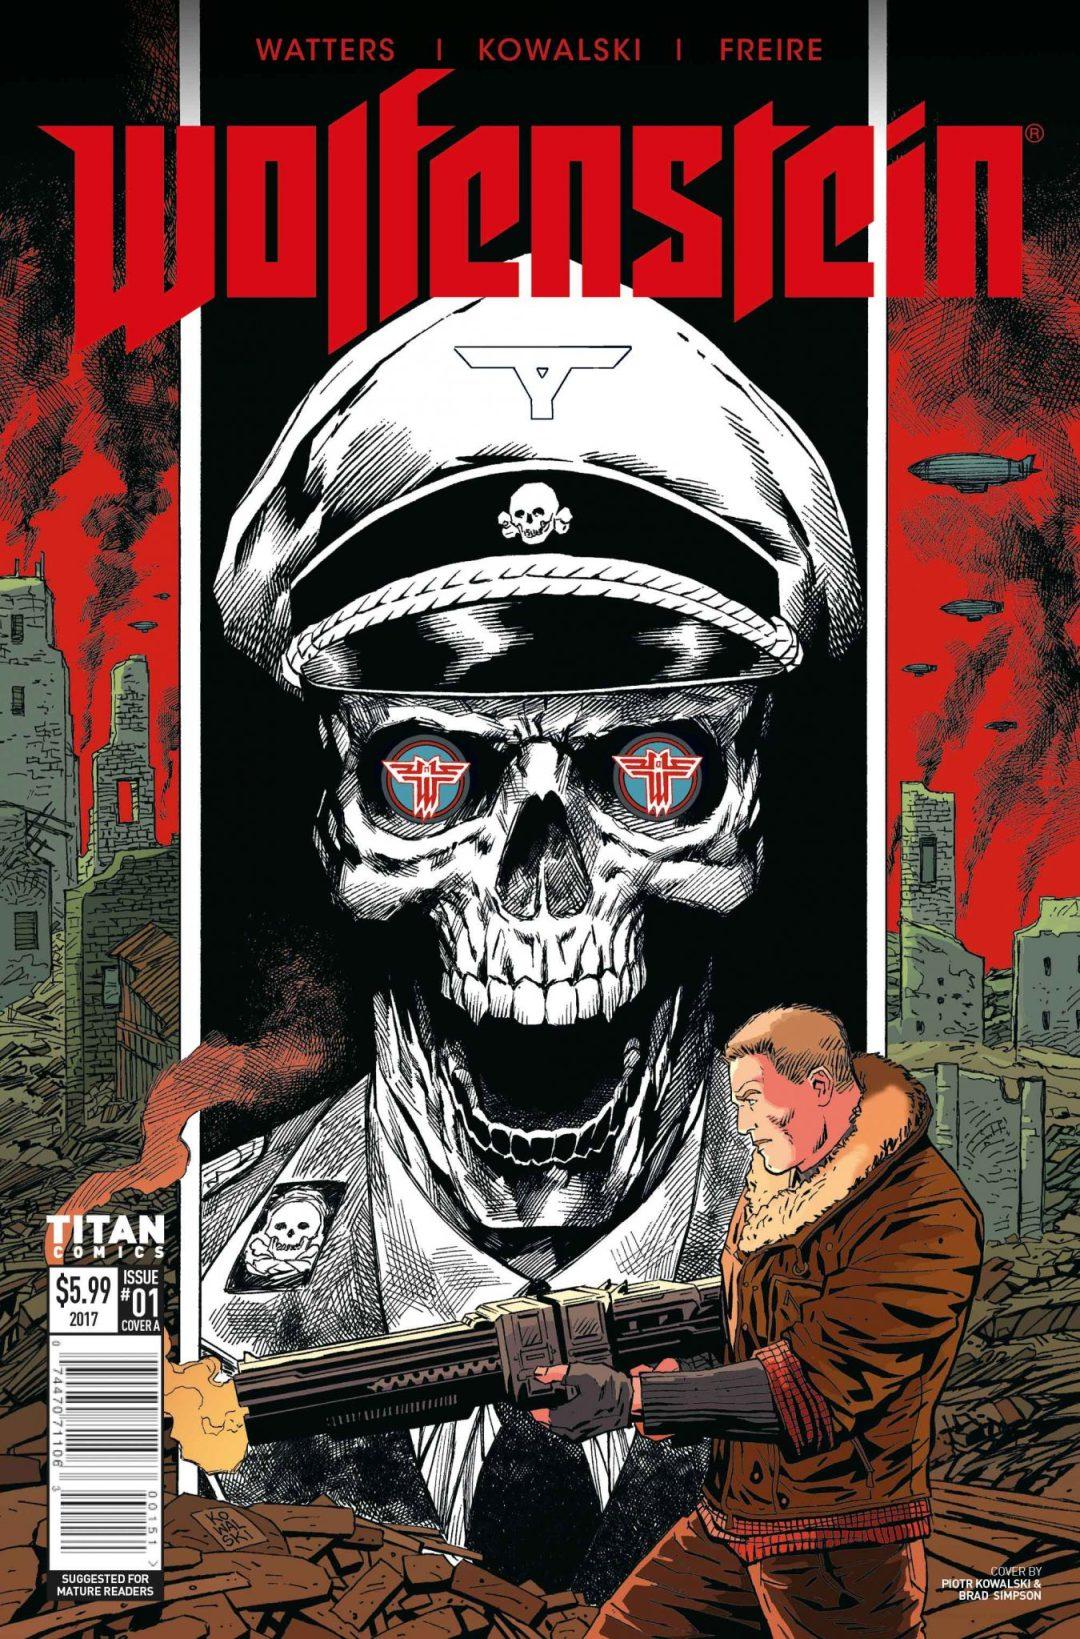 'Wolfenstein Issue #1' – First Interior Art from Prequel to Upcoming Videogame 'Wolfenstein II: The New Colossus!'